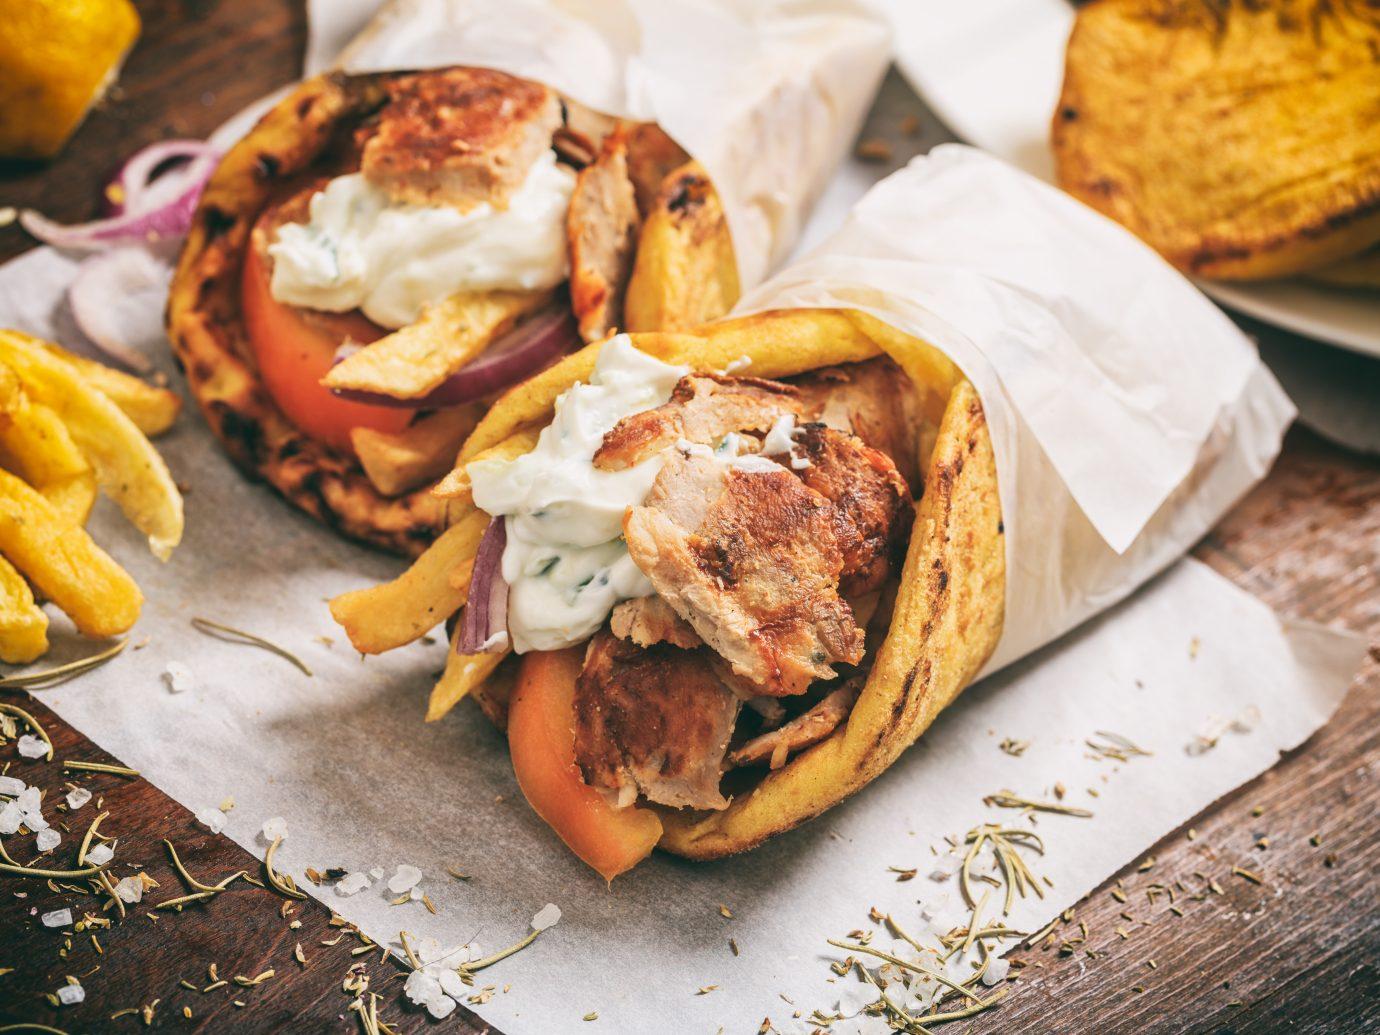 Greek gyros wraped in a pita bread on a wooden background